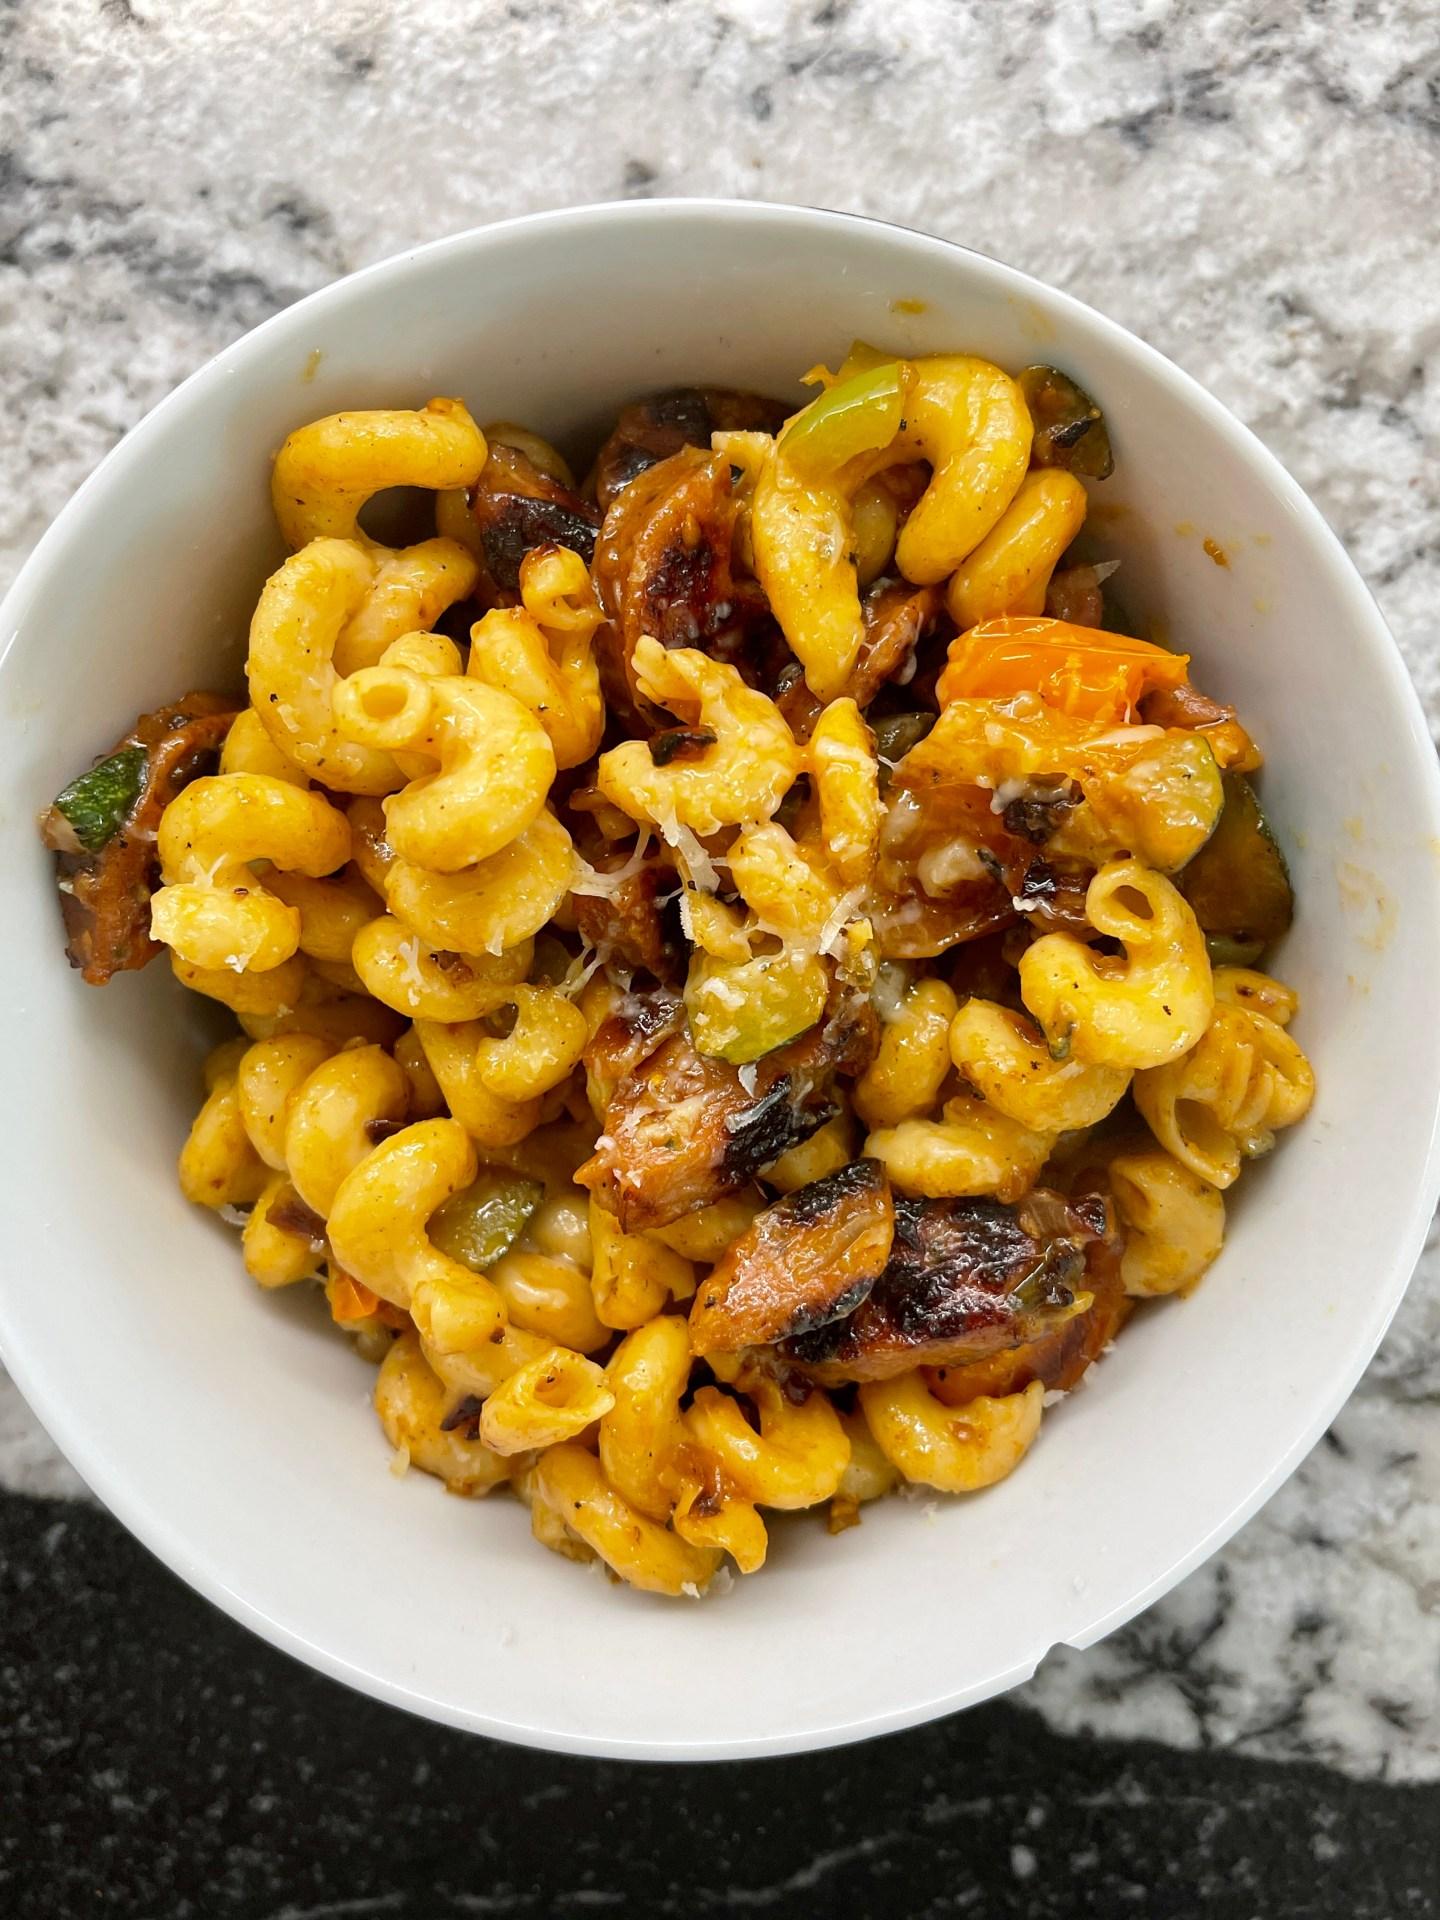 Nita Mann shares her squash pasta recipe